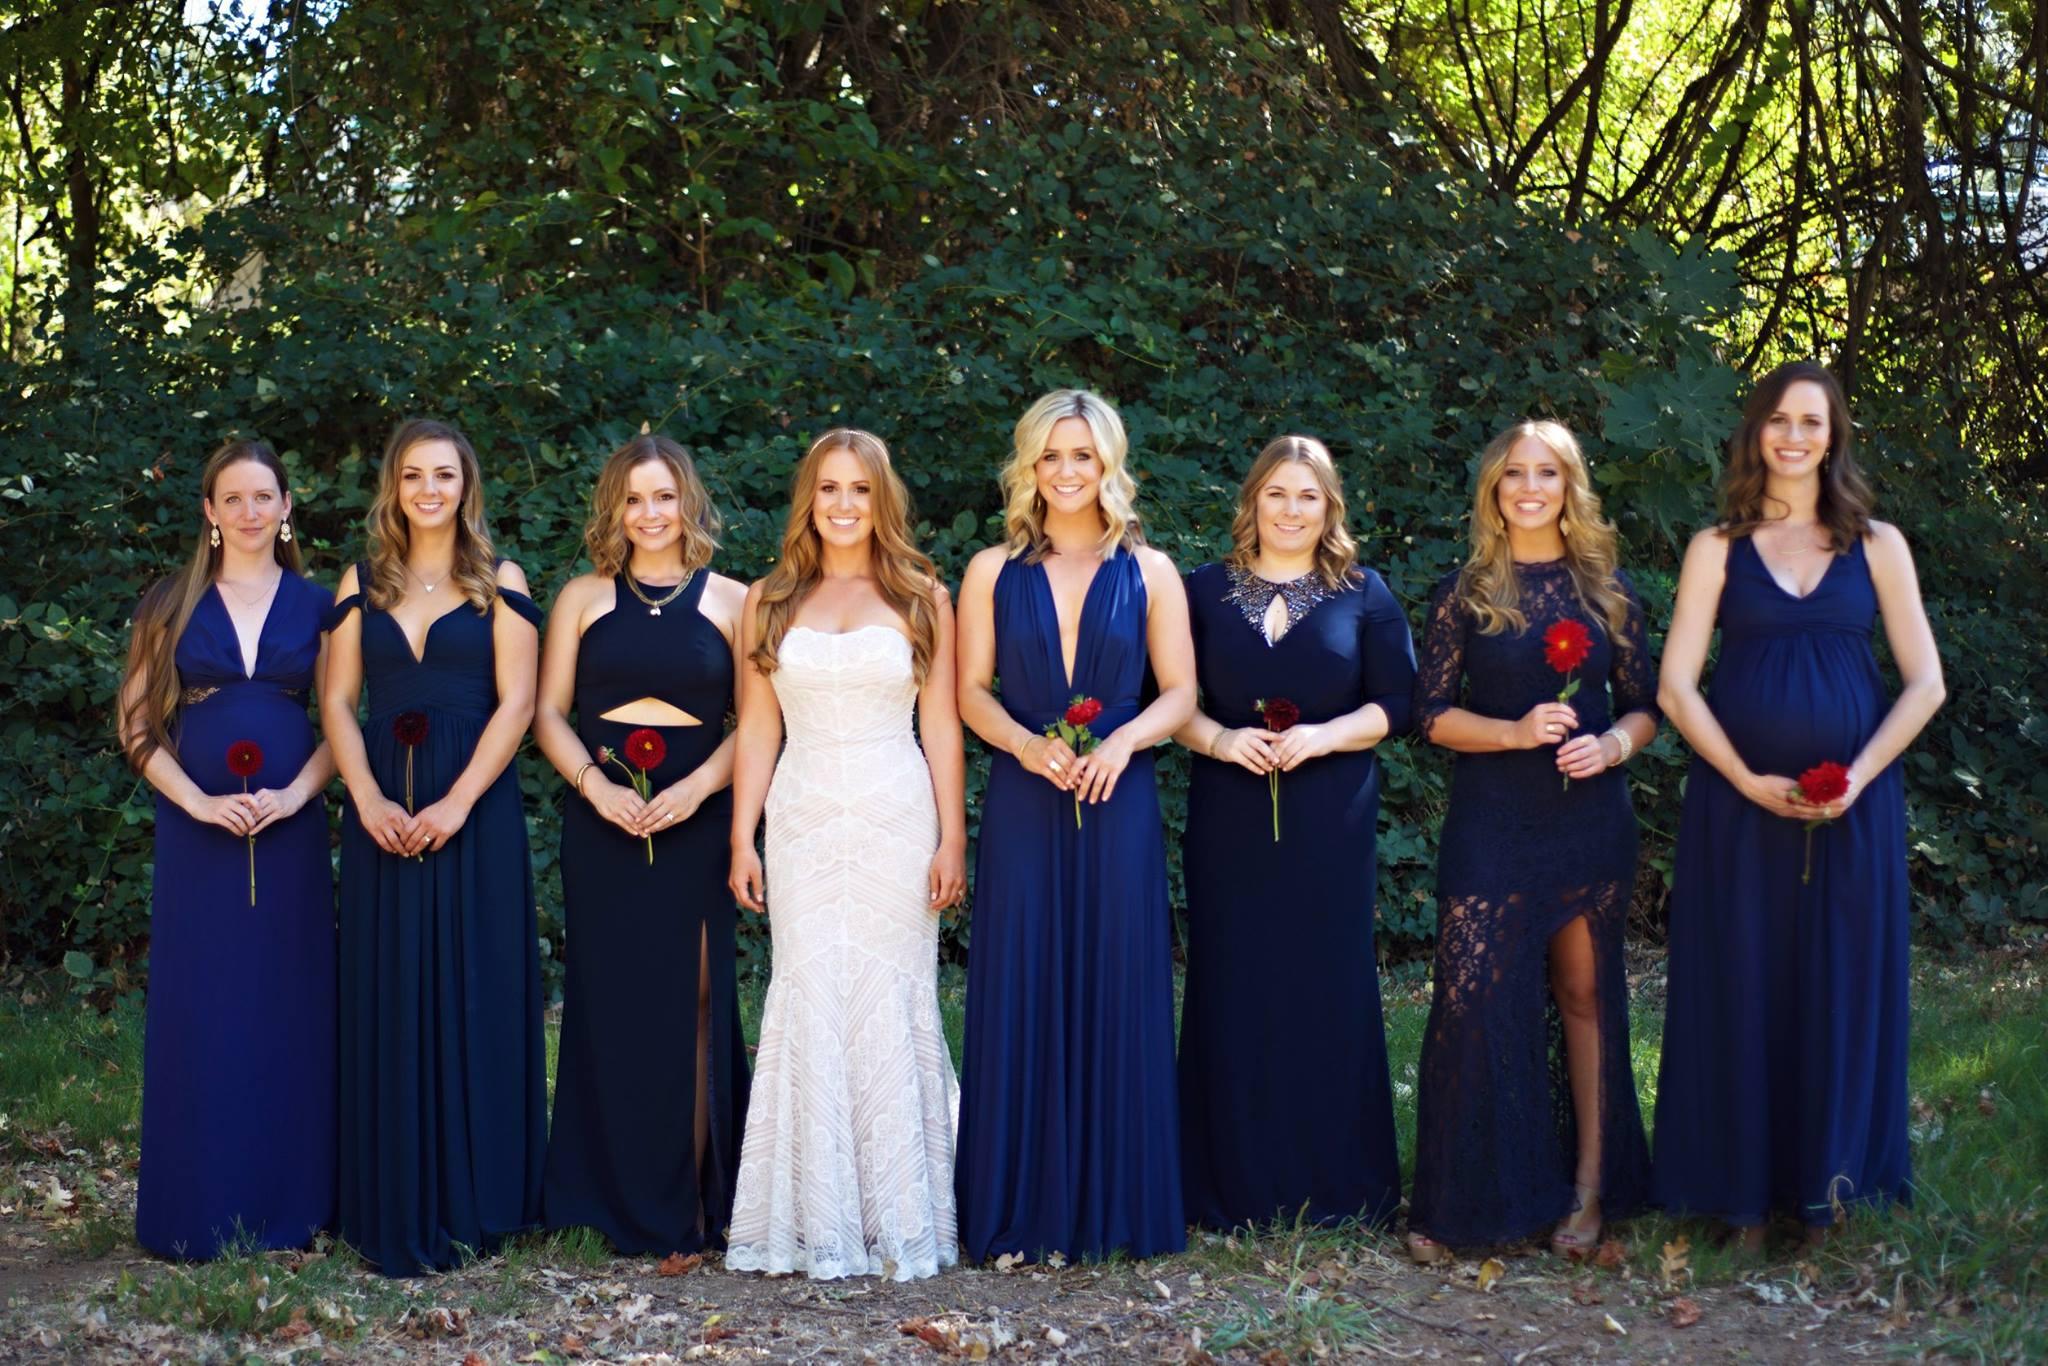 wedding photo 22.jpg